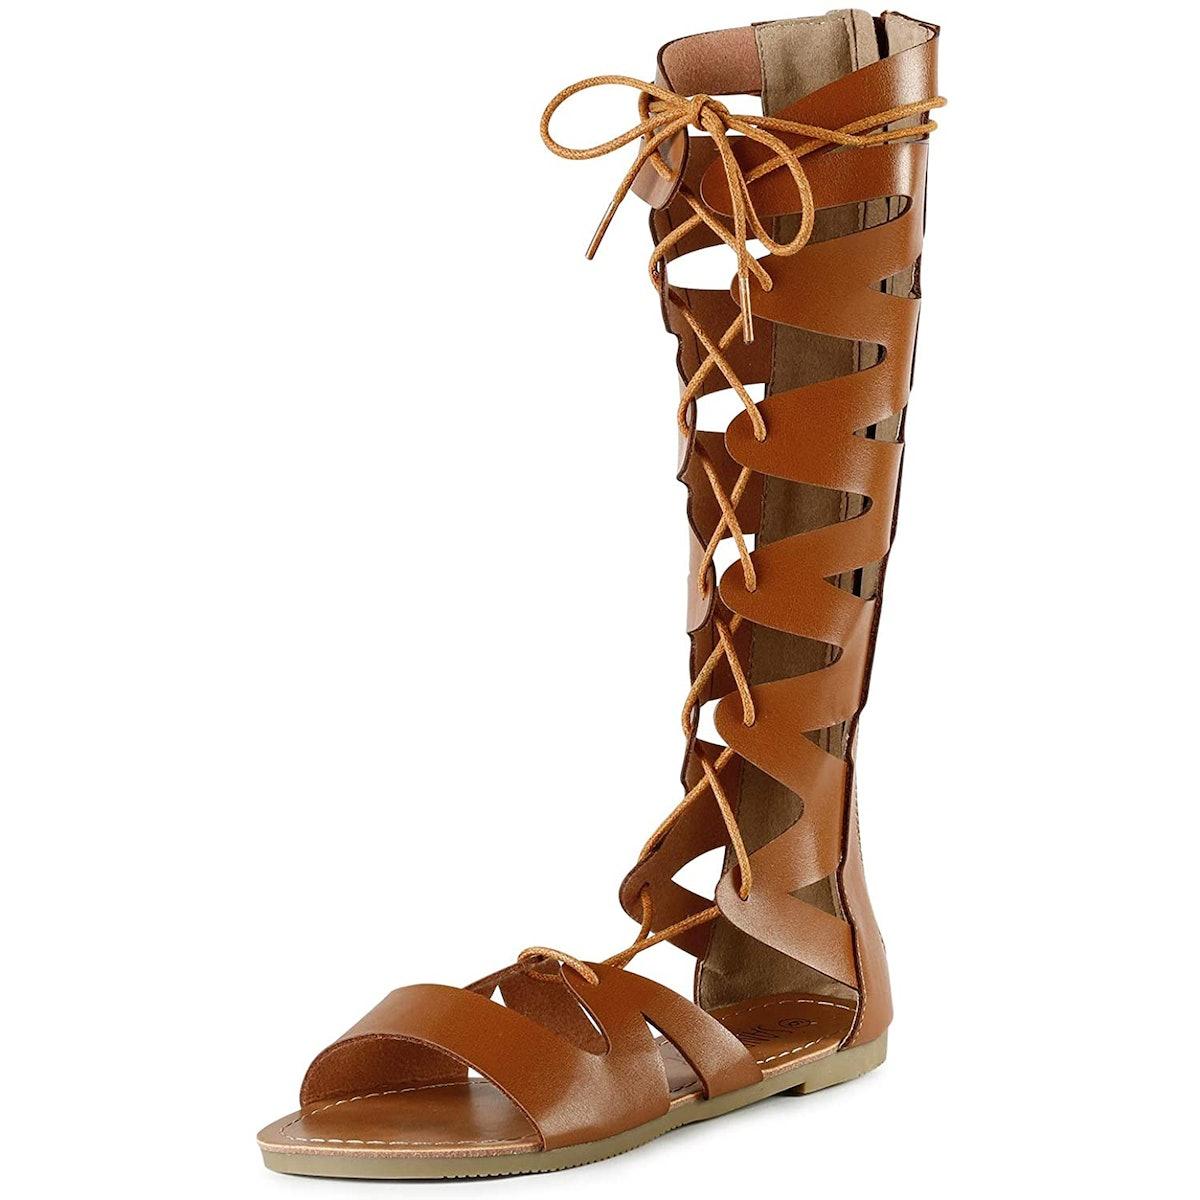 SANDALUP Knee-High Flat Gladiator Sandals